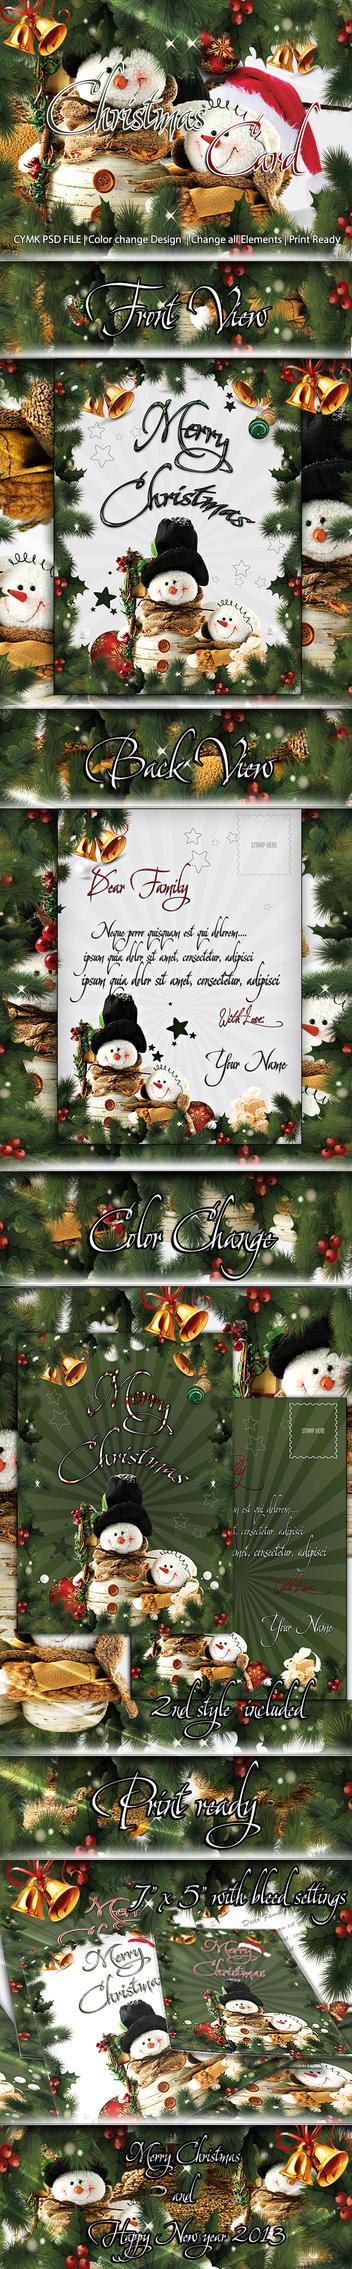 Christmas Card PSD by koko26